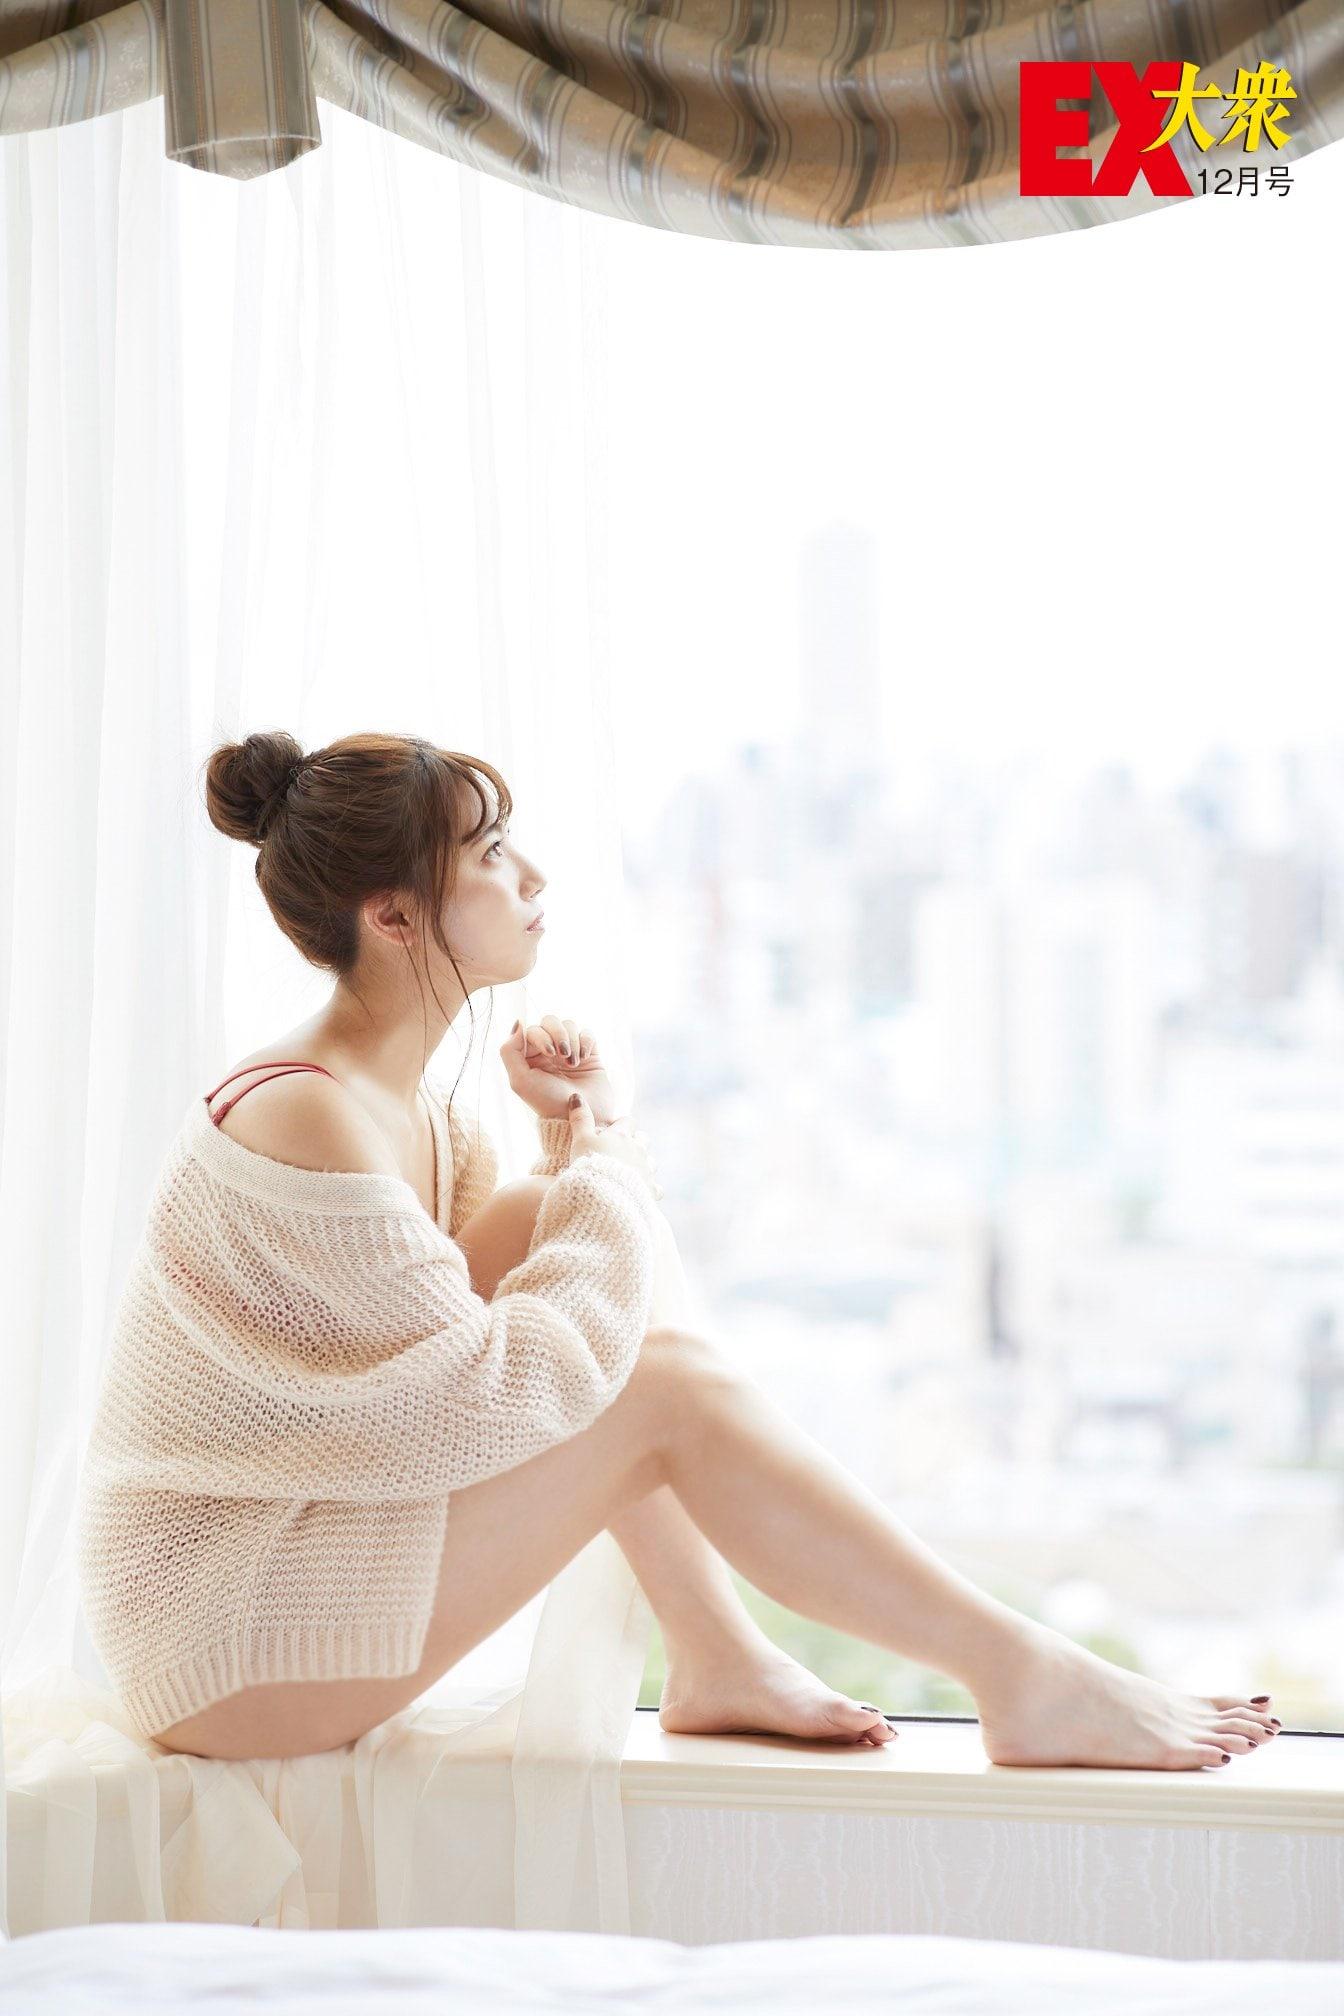 SKE48荒井優希の本誌未掲載カット6枚を大公開!【EX大衆12月号】の画像002